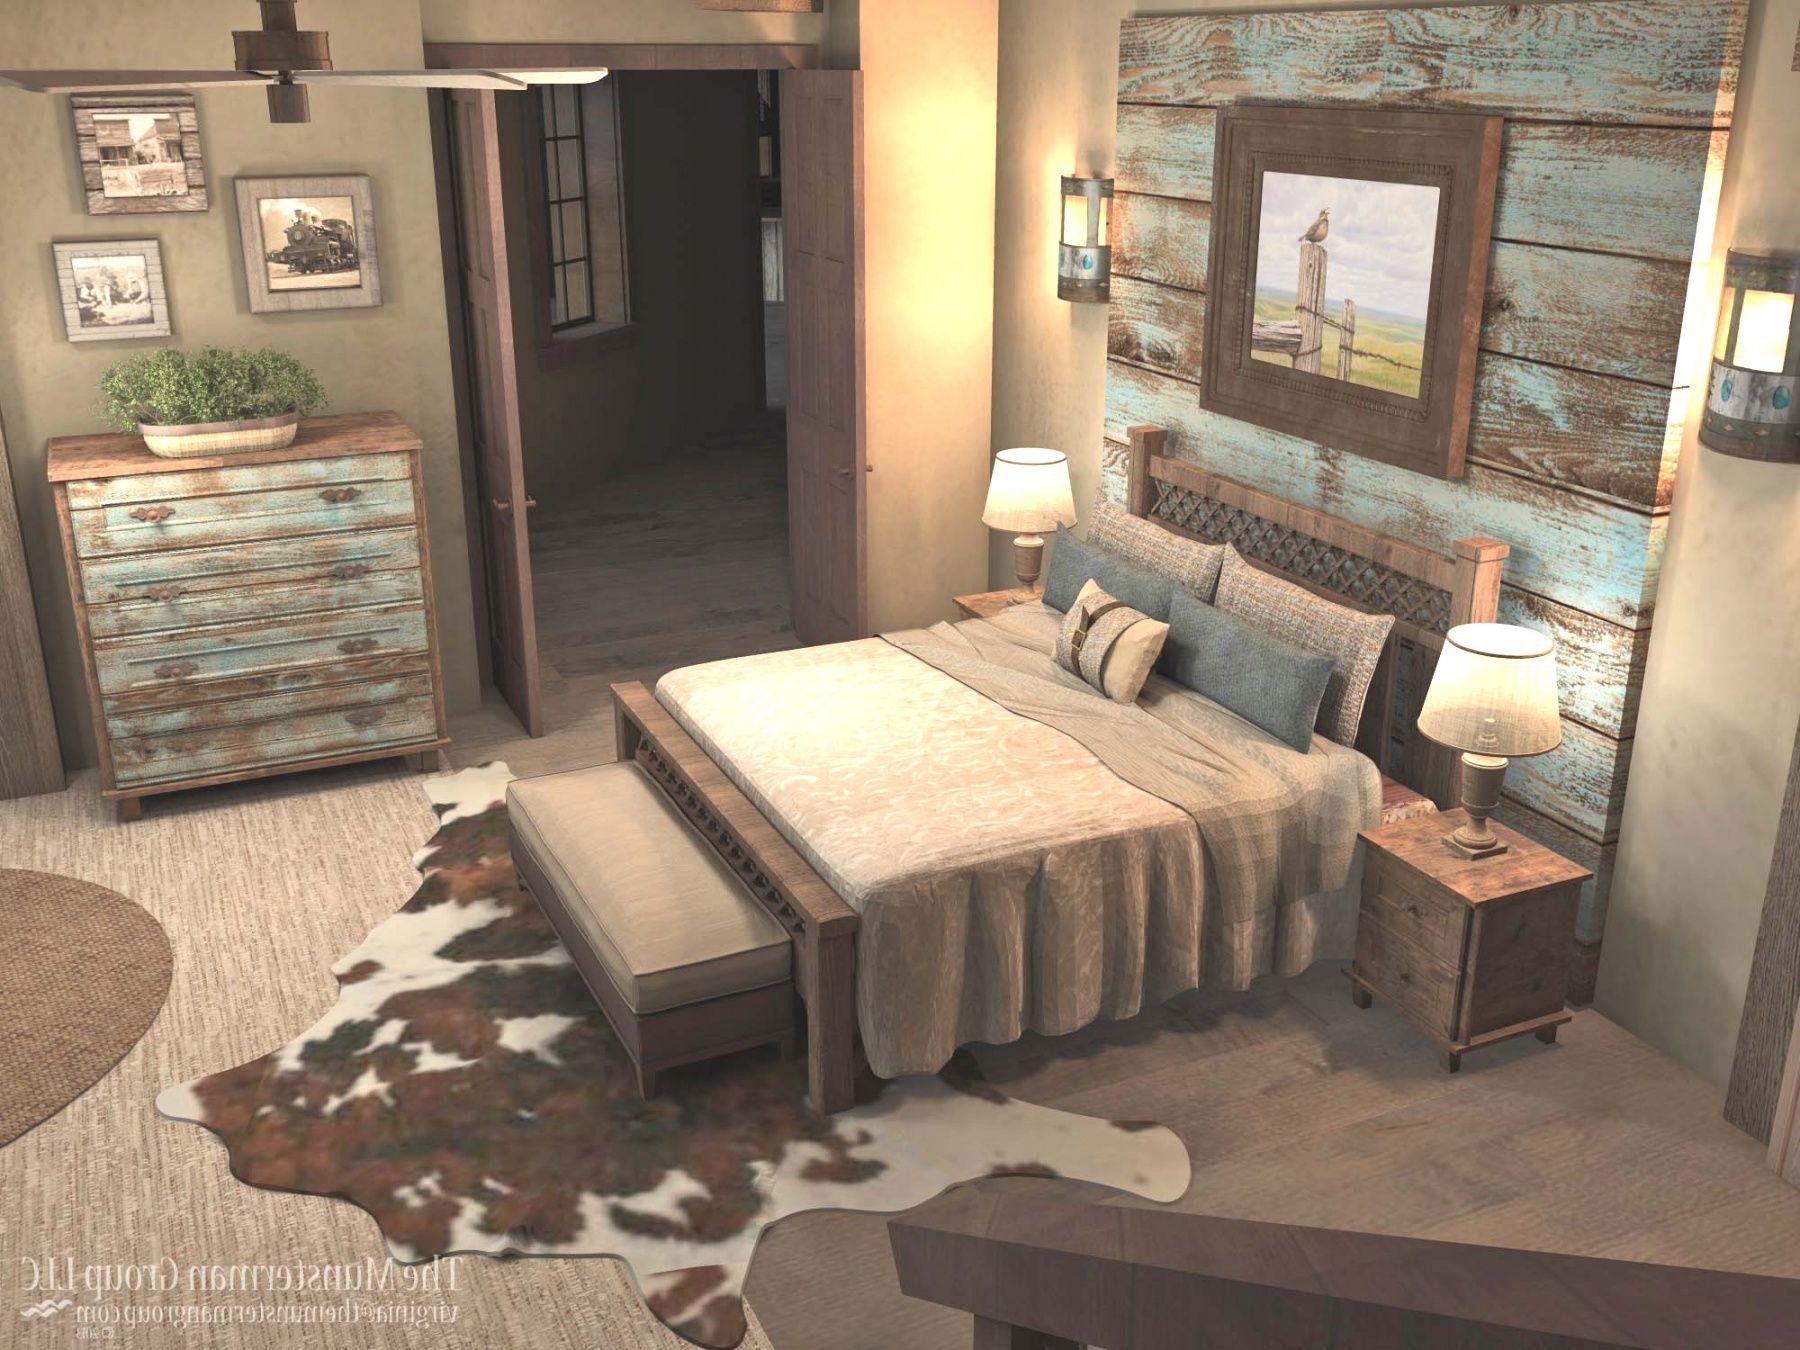 Western Themed Bedroom Ideas In 2020 Rustic Romantic Bedroom Remodel Bedroom Rustic Farmhouse Bedroom